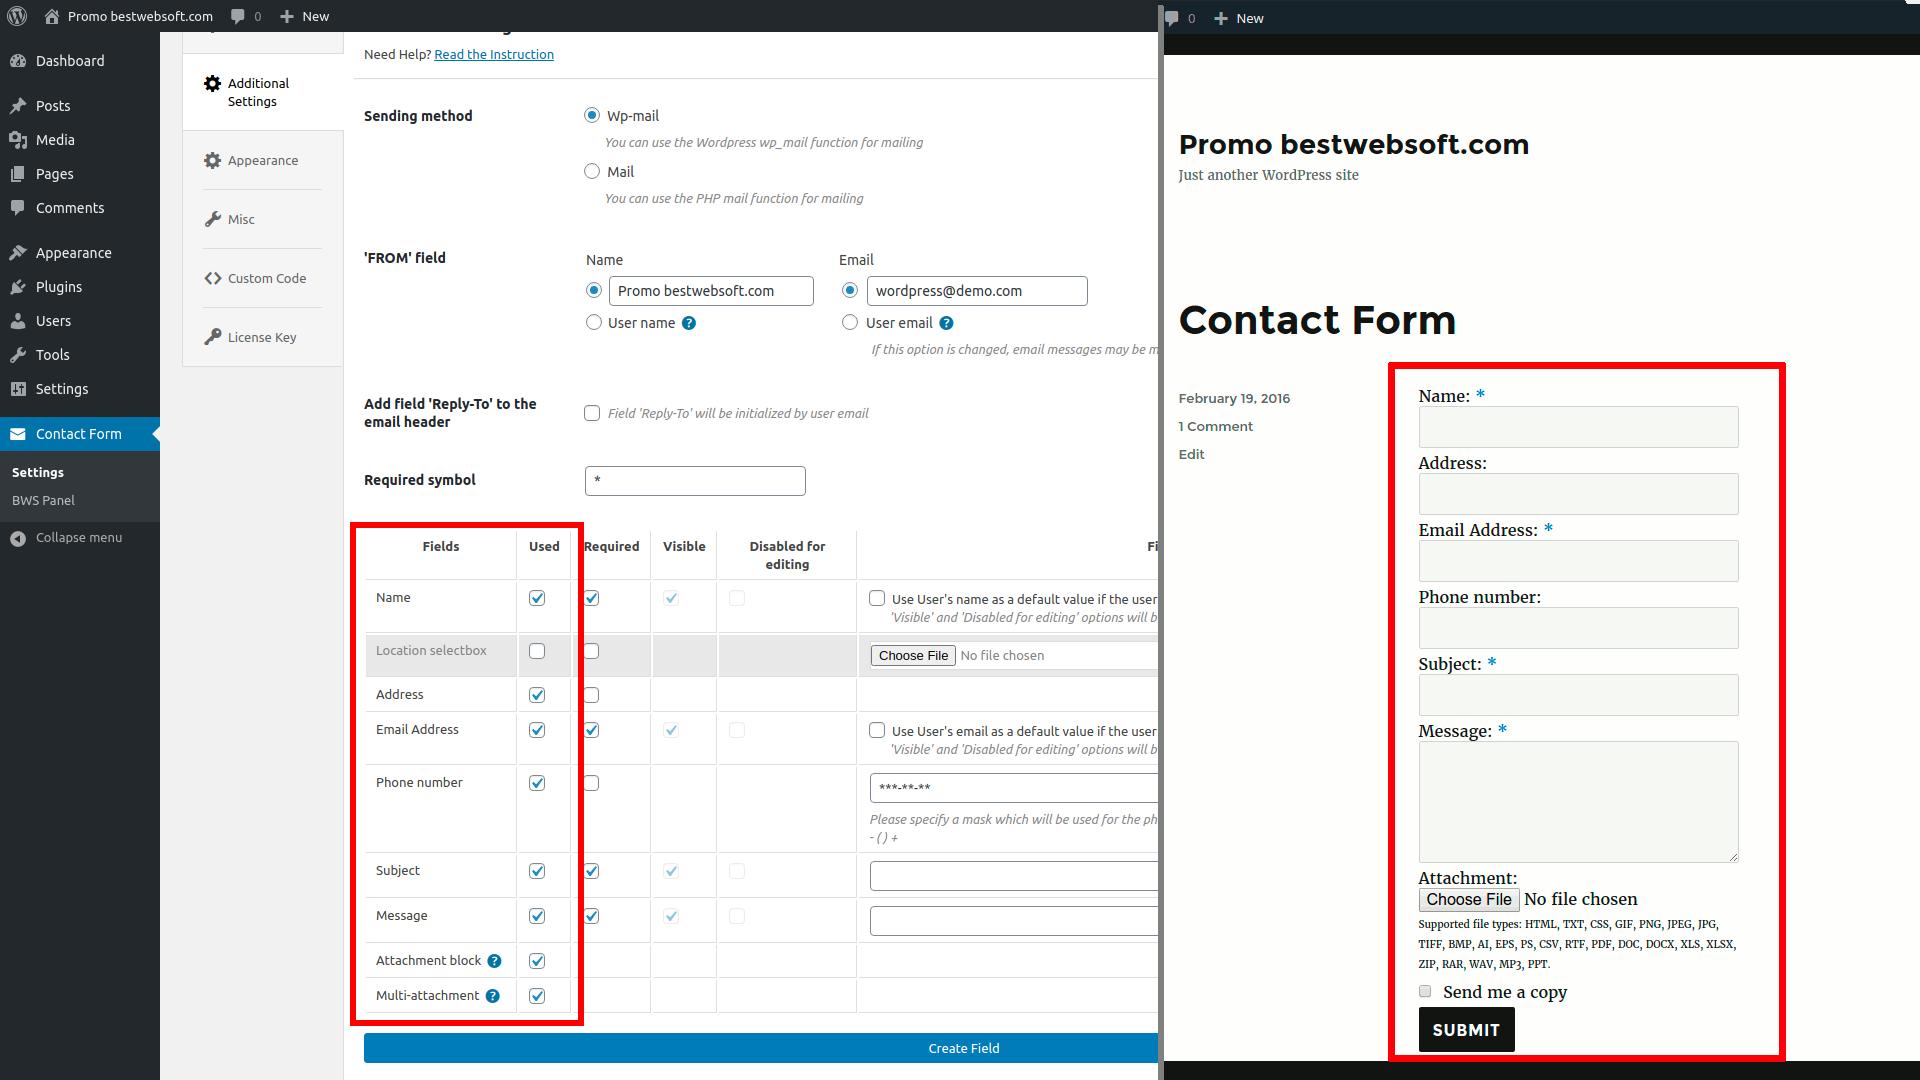 contact form screenshot 14